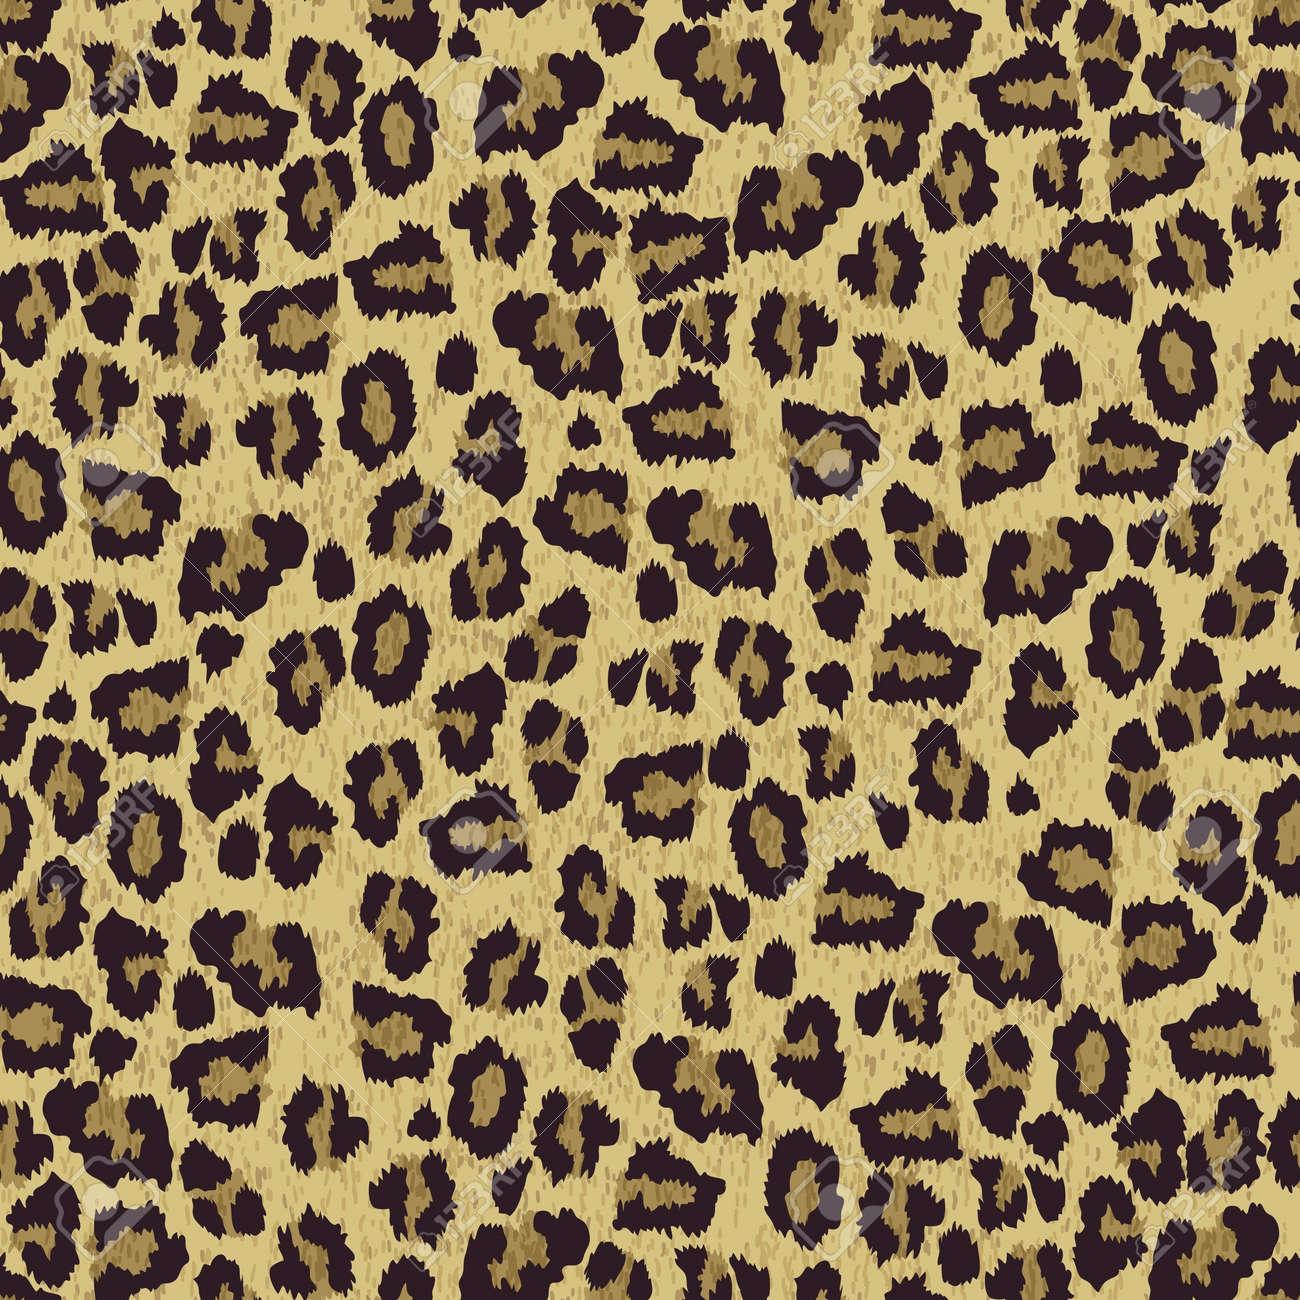 Leopard skin texture - 21525401